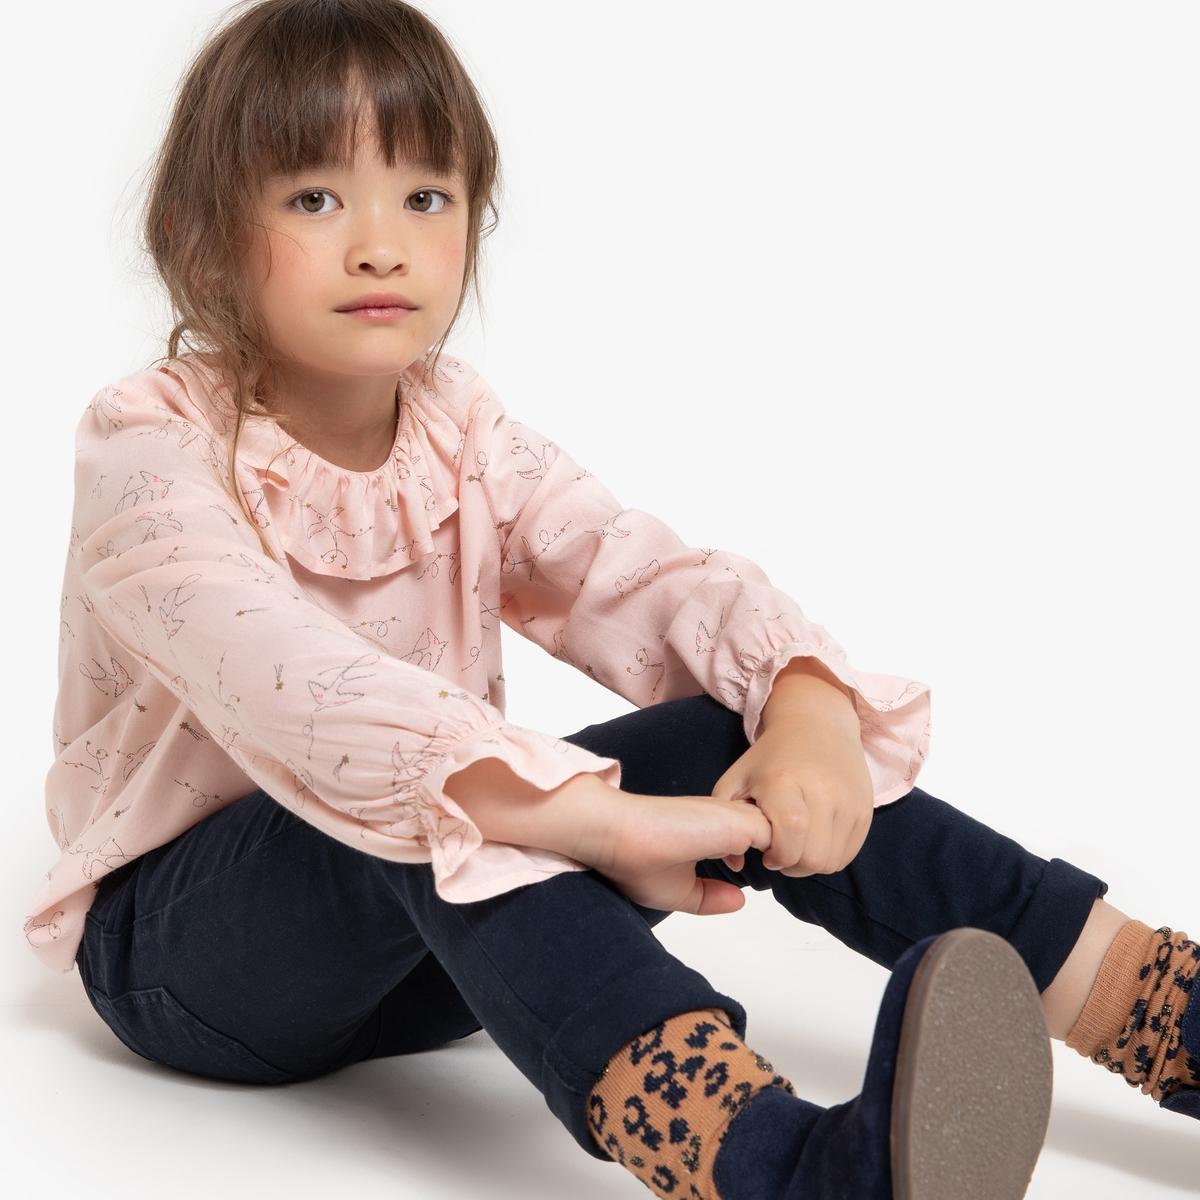 Блузка La Redoute С воланами и принтом ласточки 12 лет -150 см другие пижама la redoute с шортами и цветочным принтом 12 лет 150 см другие